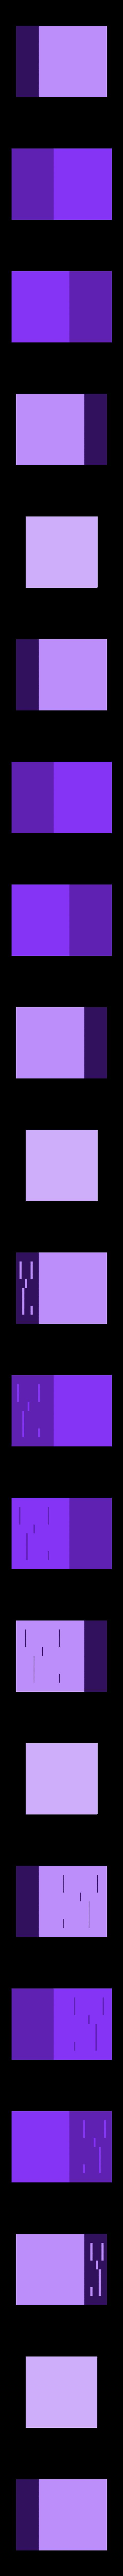 creeper_pot_square.stl Download free STL file Minecraft Creeper Planter / Pot • Object to 3D print, ranibizumab